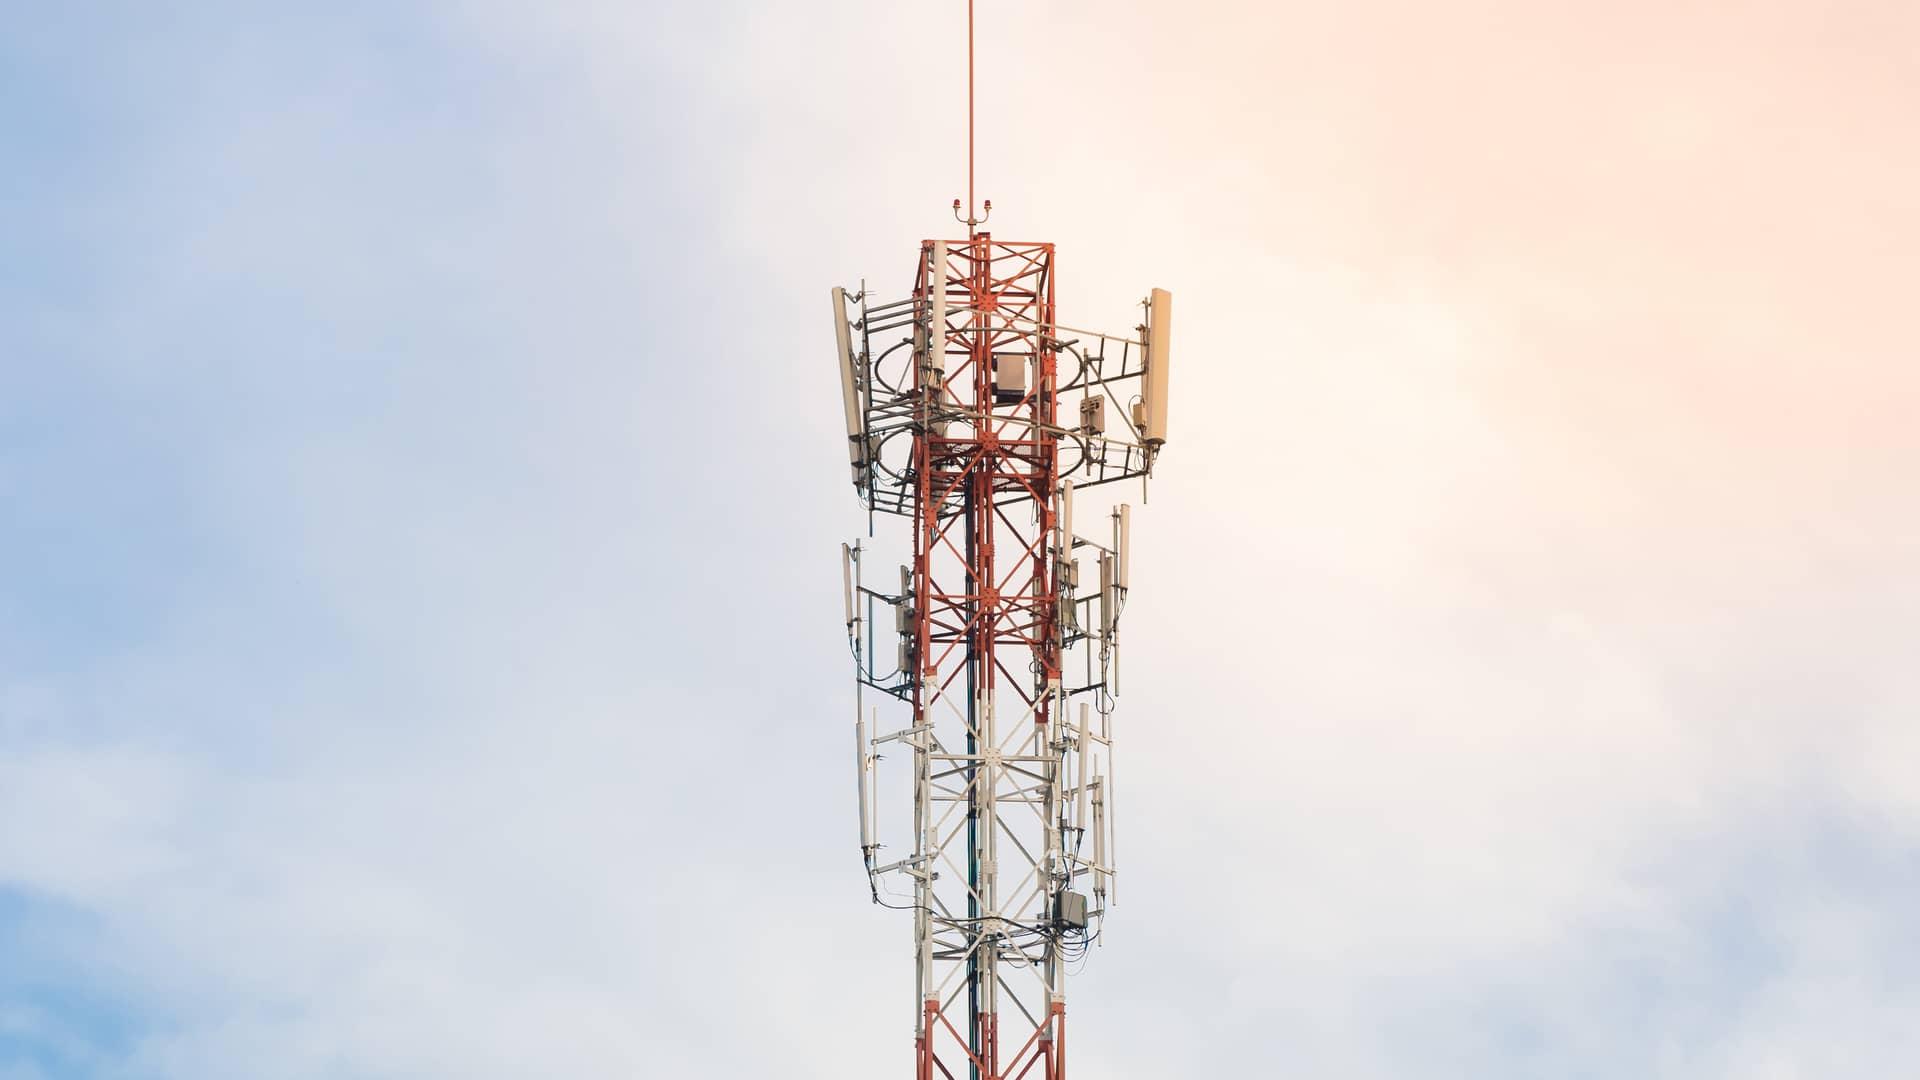 Torre de telecomunicaciones con antenas con cielo azul representa cobertura